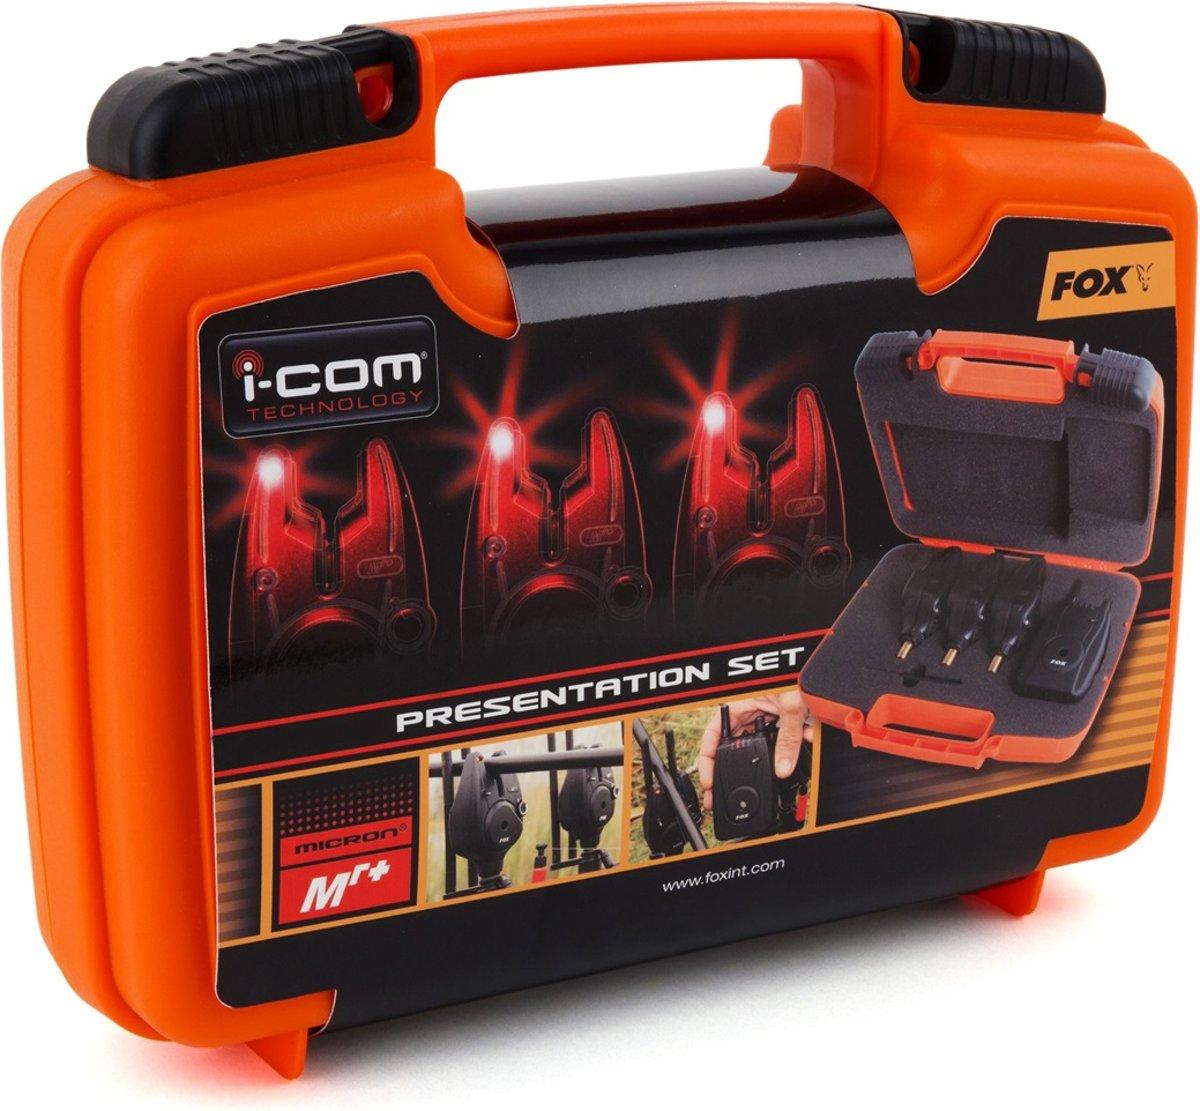 Fox Micron MR+ 3 Rod - Beetmelderset - 3+1